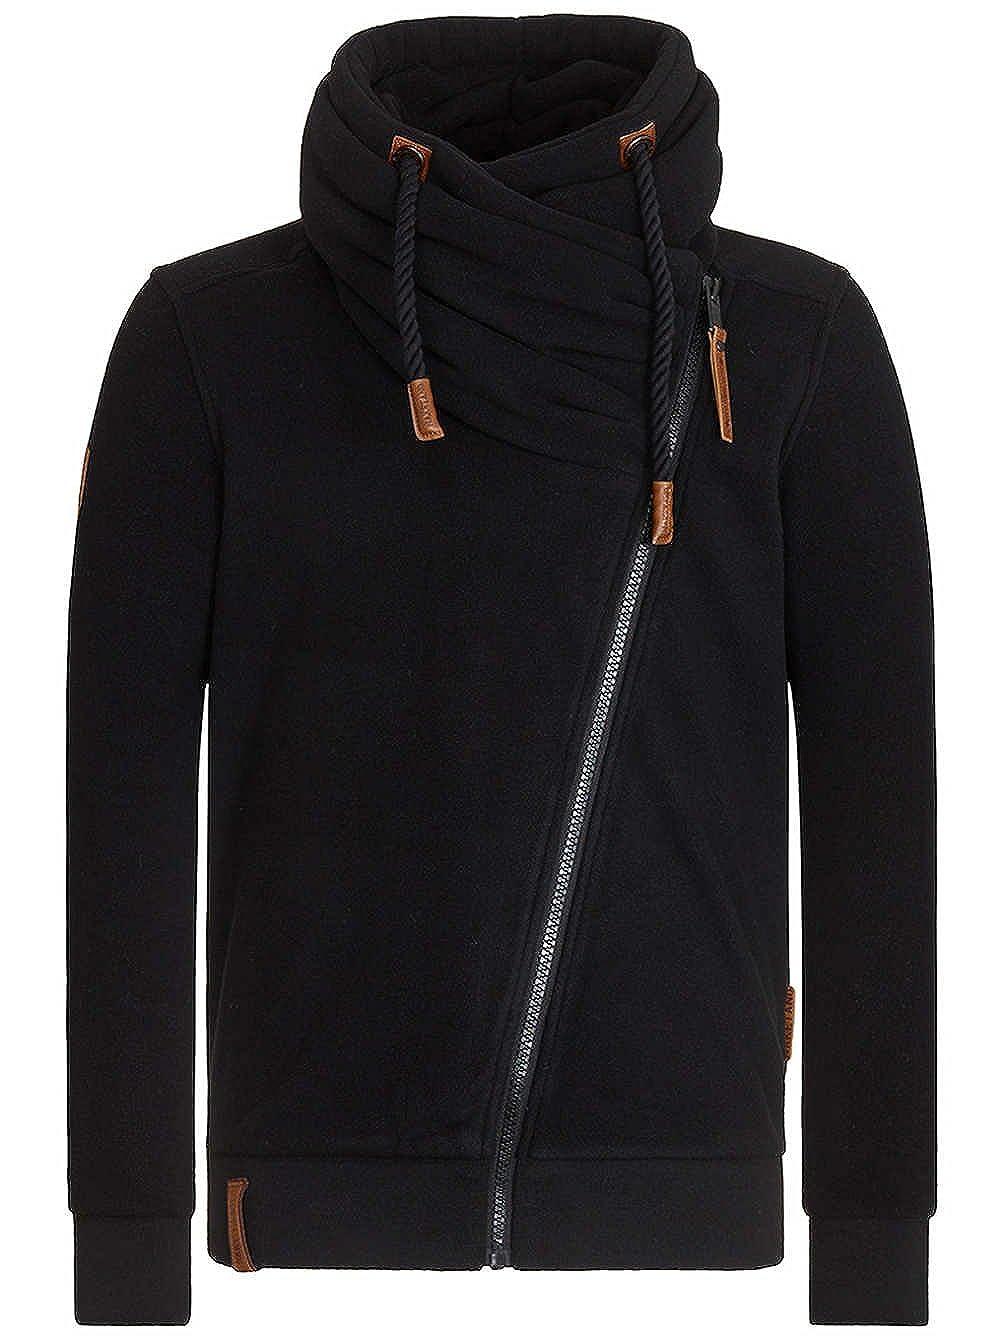 Zipped Jacket ´Gnadenlos durchgerattert II´ Naketano